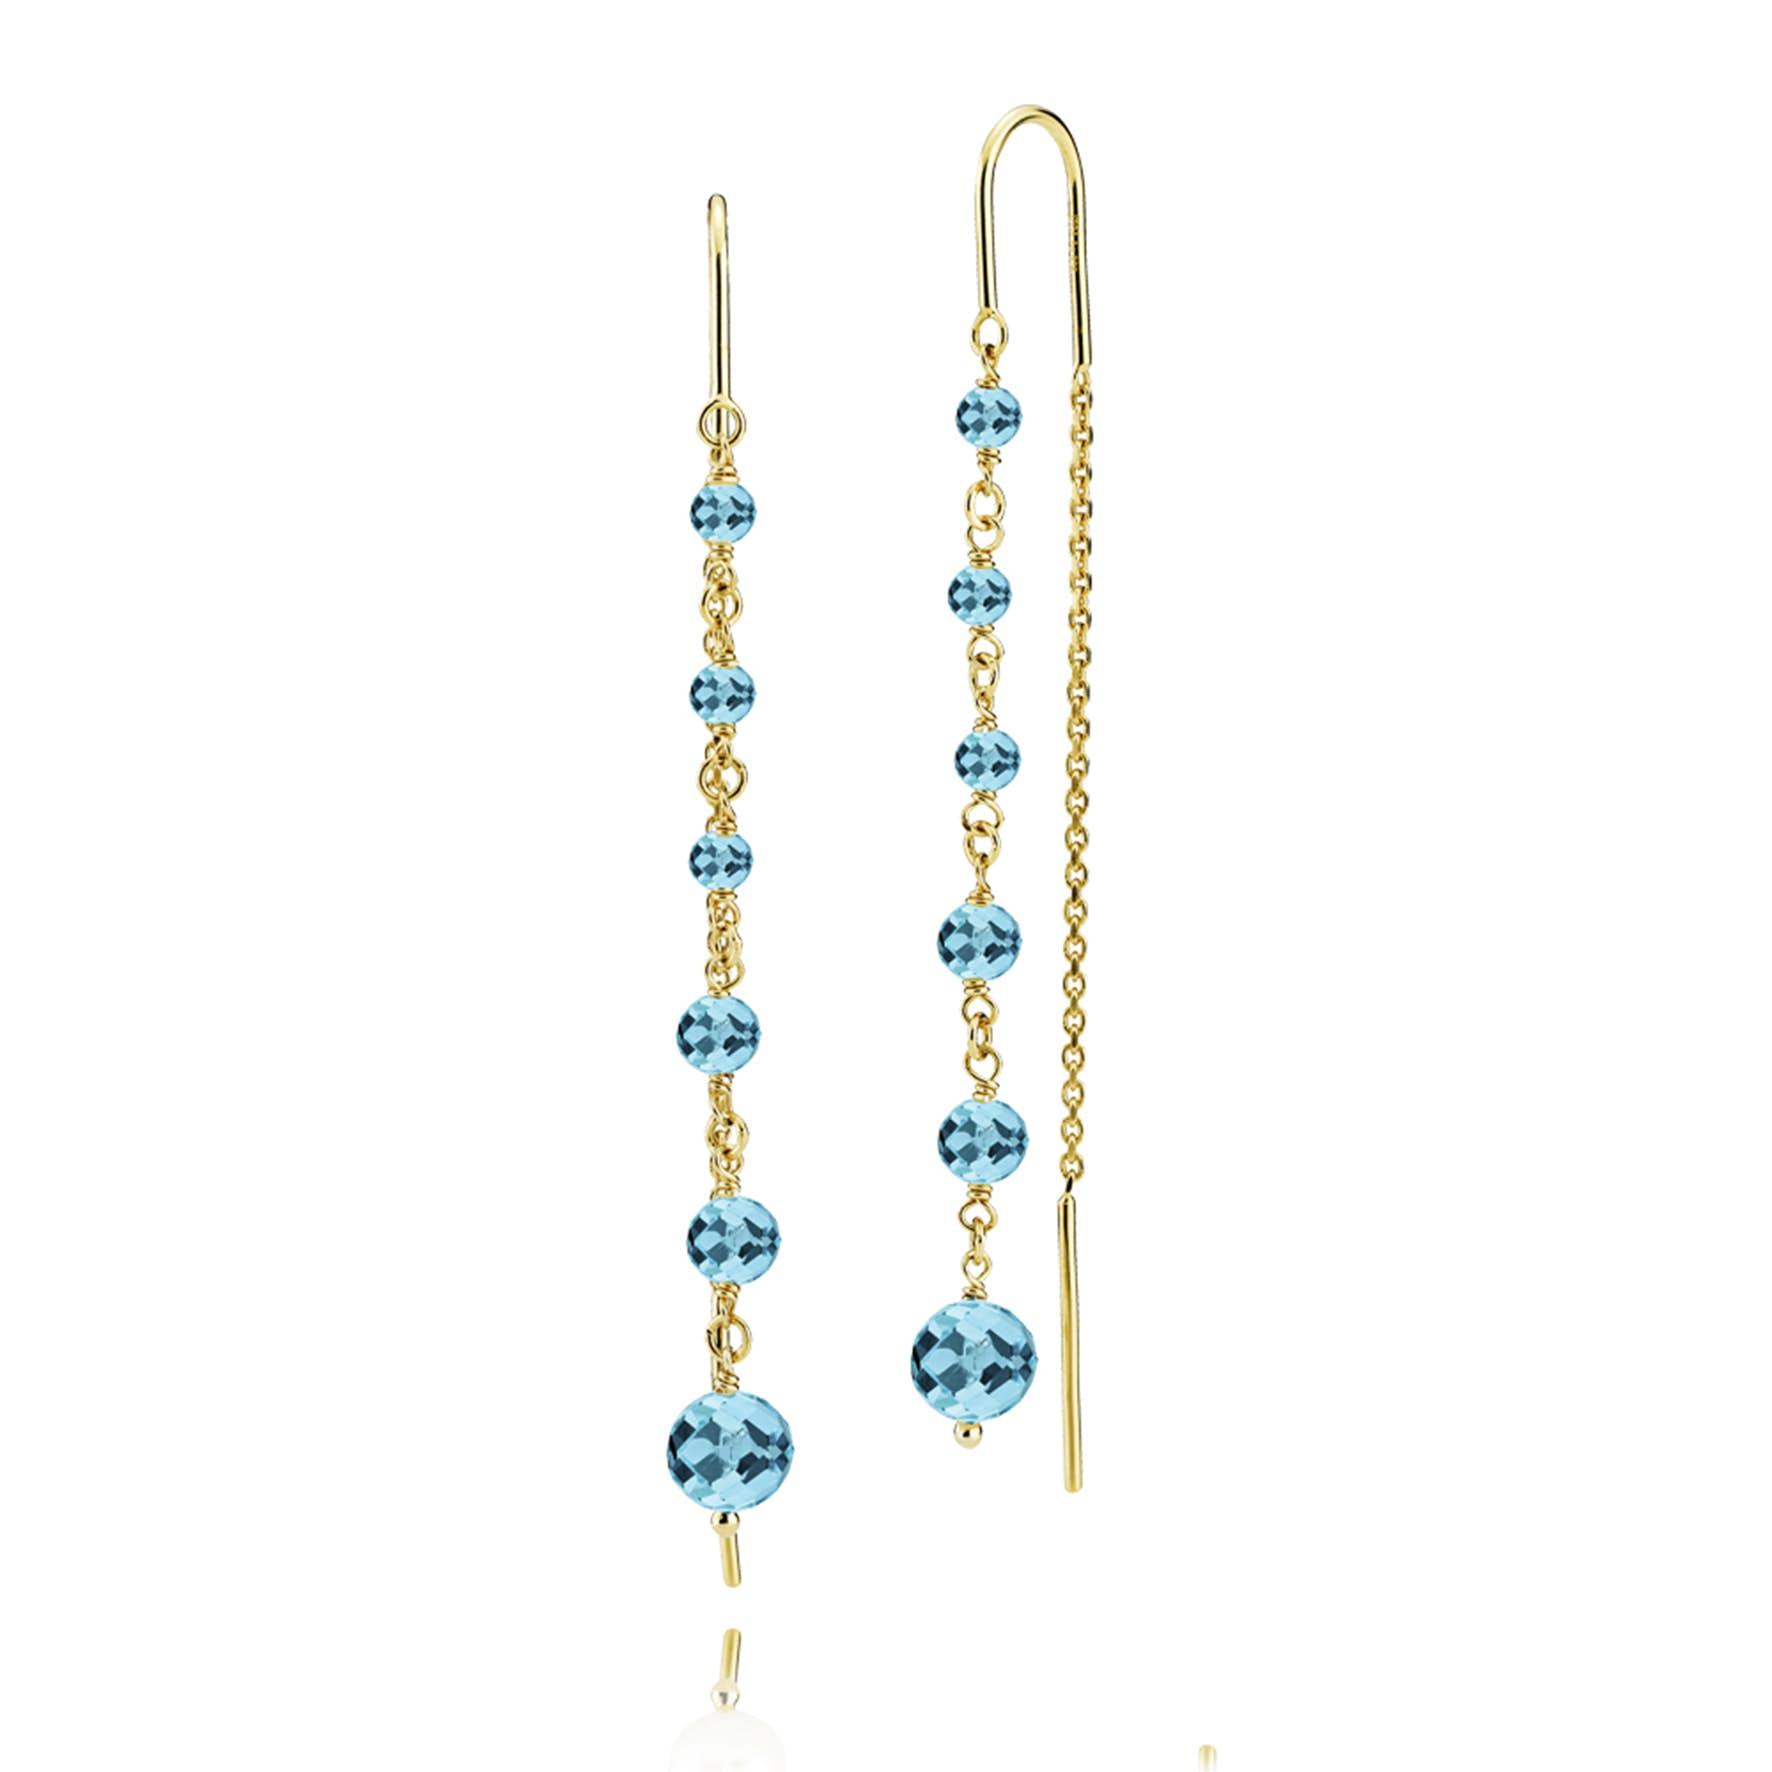 Paradise Earchains Aqua Blue fra Izabel Camille i Forgylt-Sølv Sterling 925|Aqua Blue